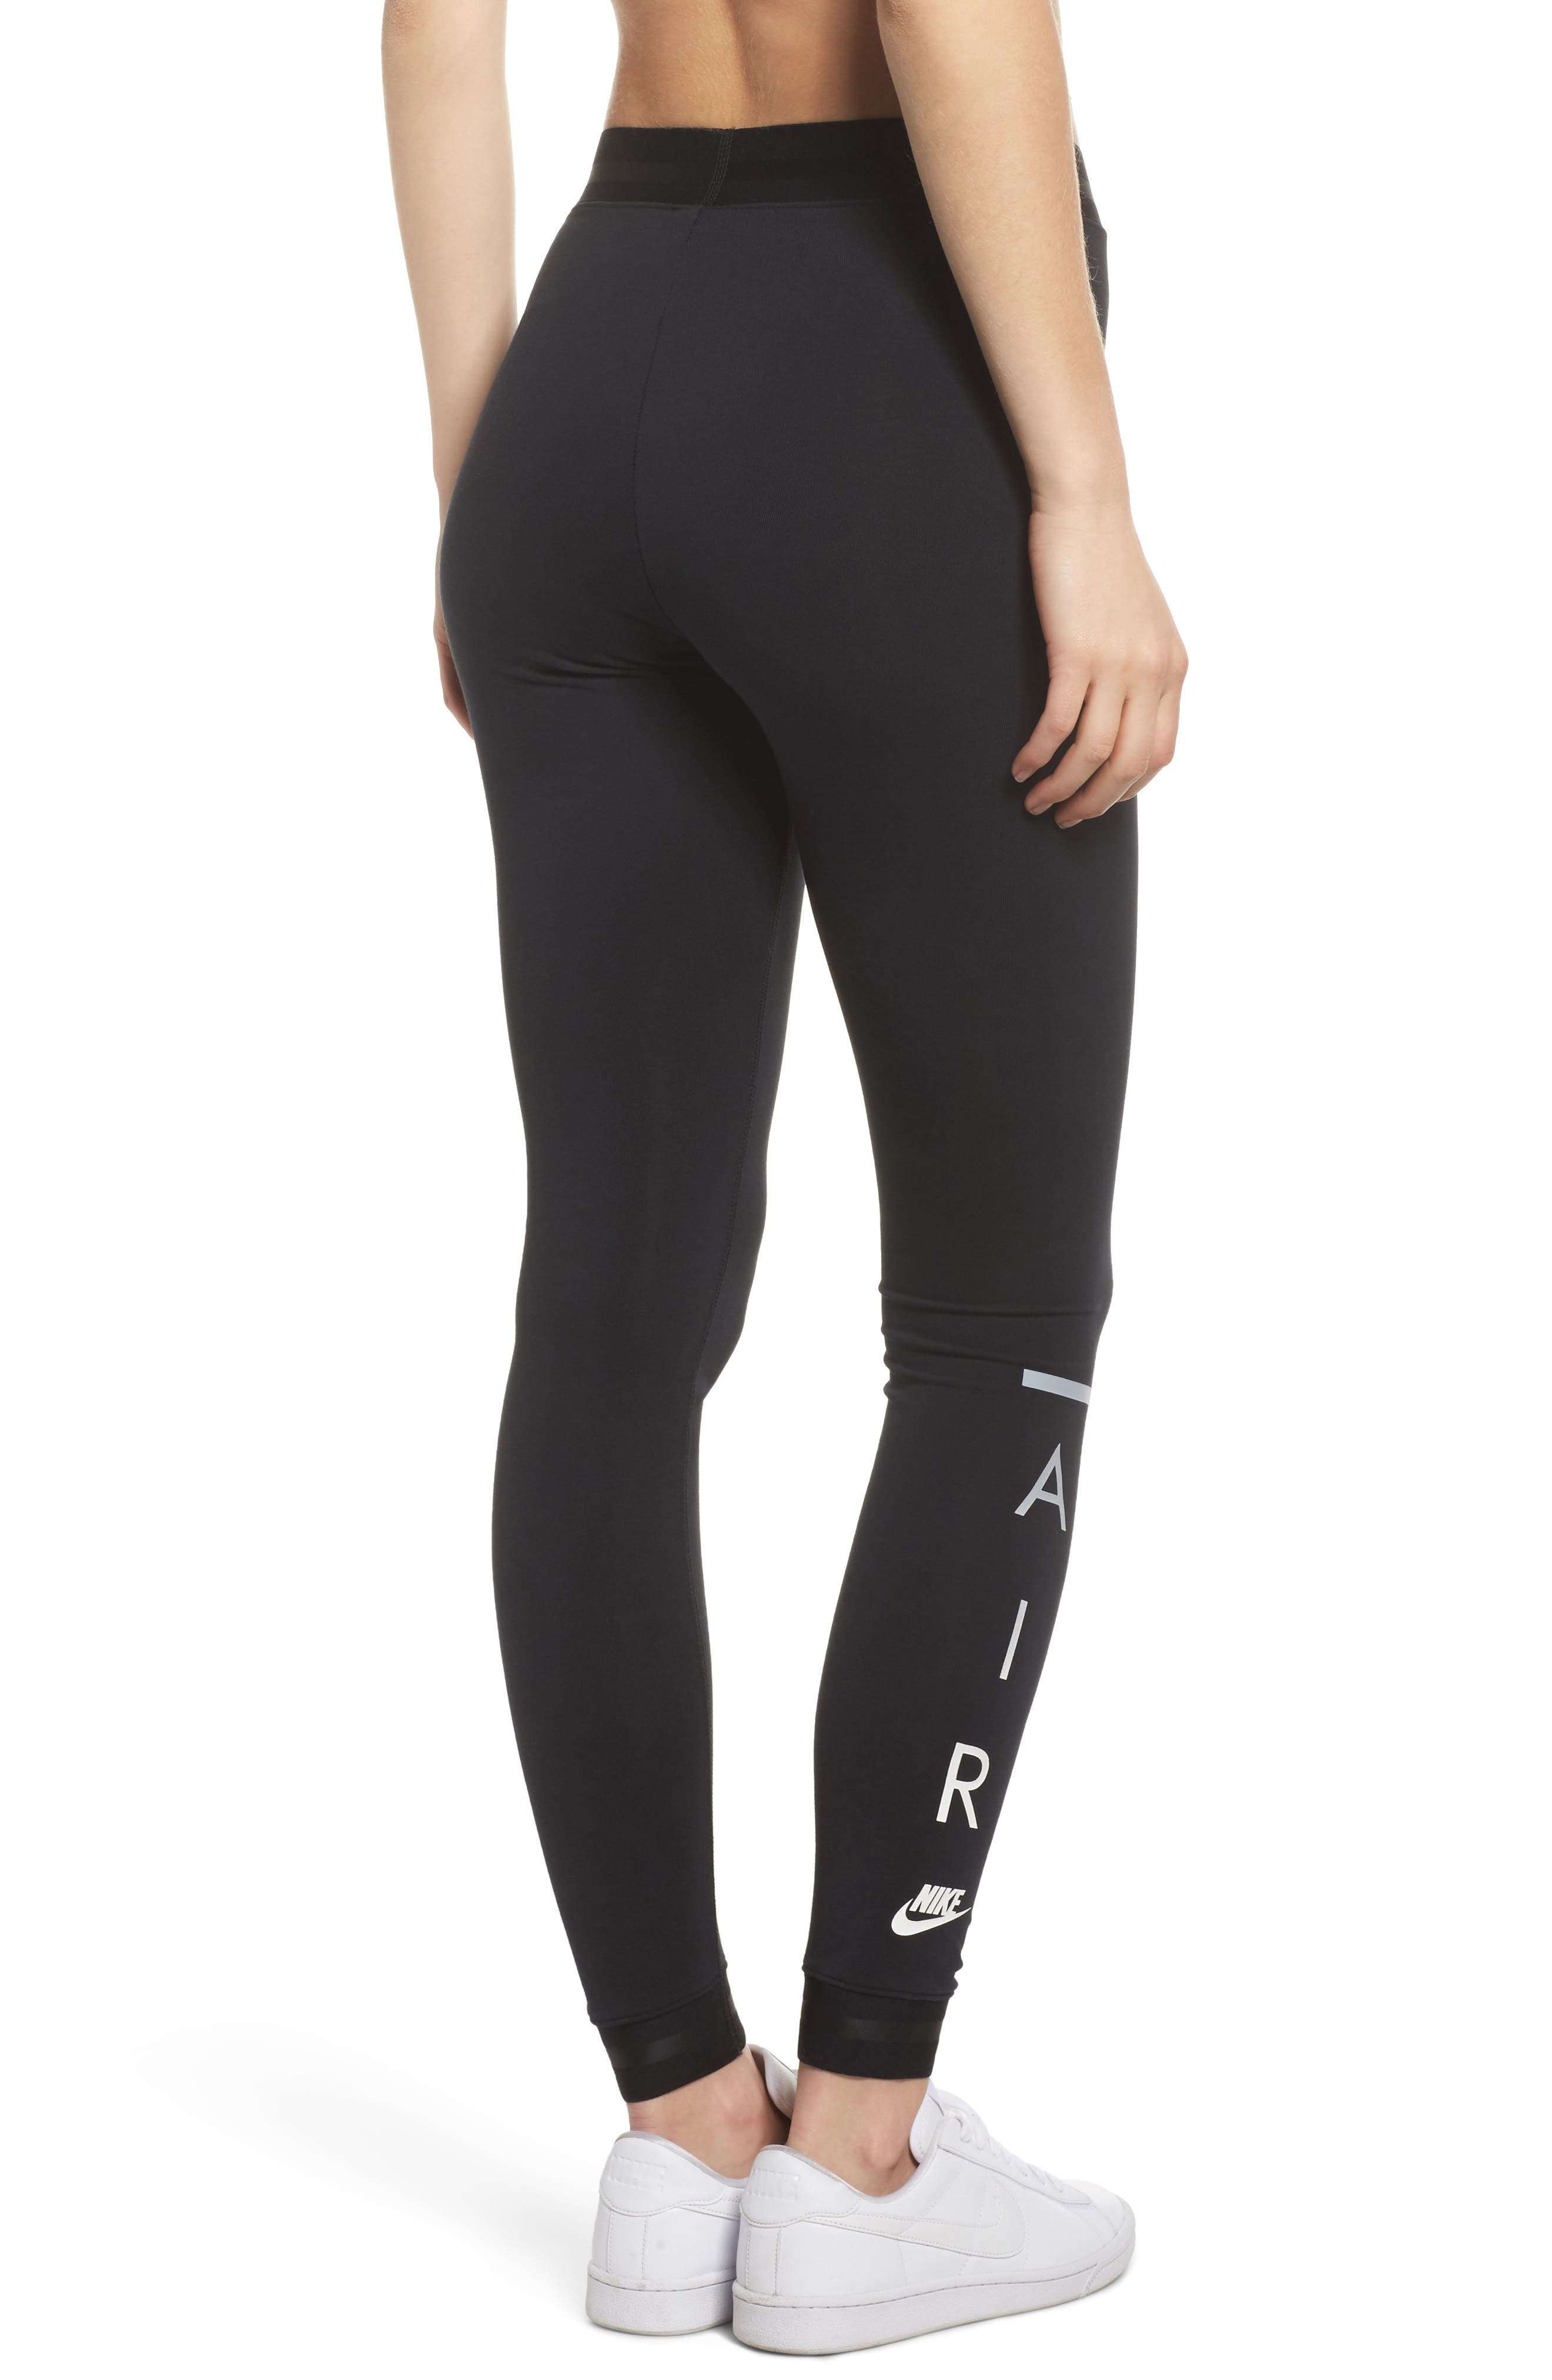 Sportswear Women's Leggings,                             Alternate thumbnail 4, color,                             BLACK/ BLACK/ BLACK